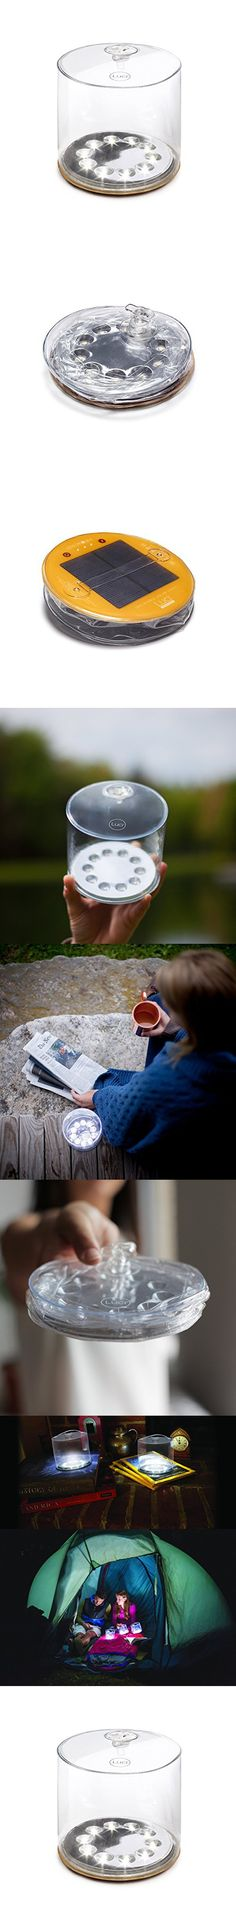 MPOWERD Luci Original - Inflatable Solar Light